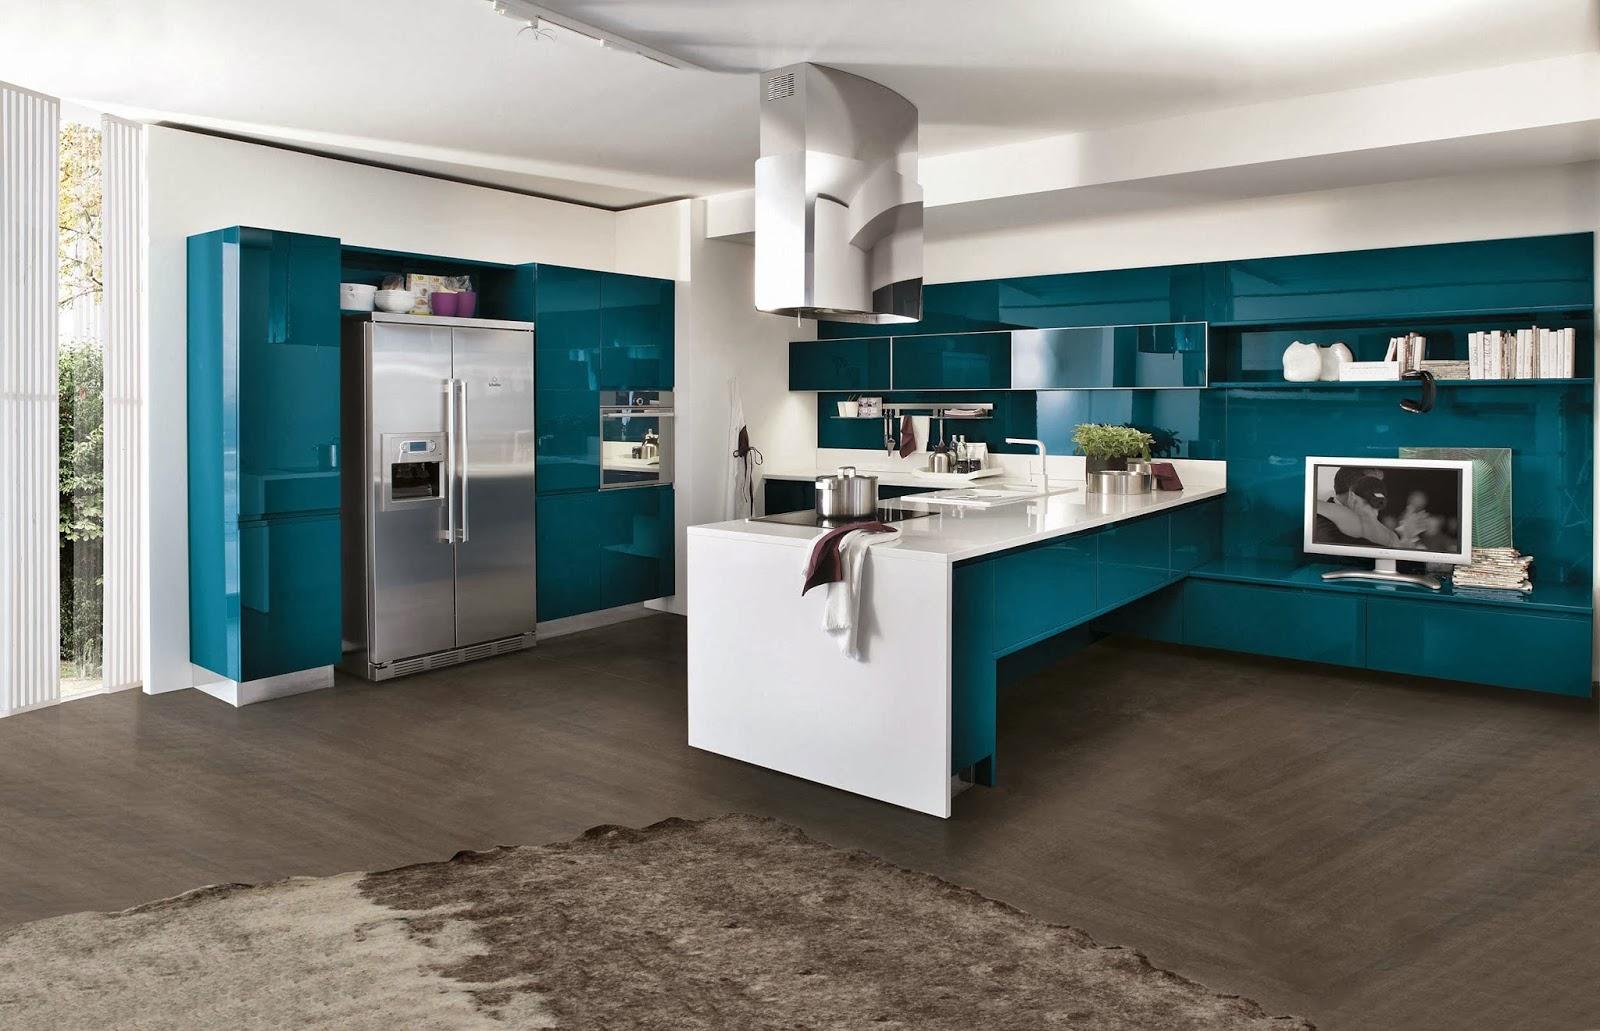 Cucine Moderne Le Migliori Soluzioni Per Arredare La Tua Cucina Stosa Bring Cucina Moderna E